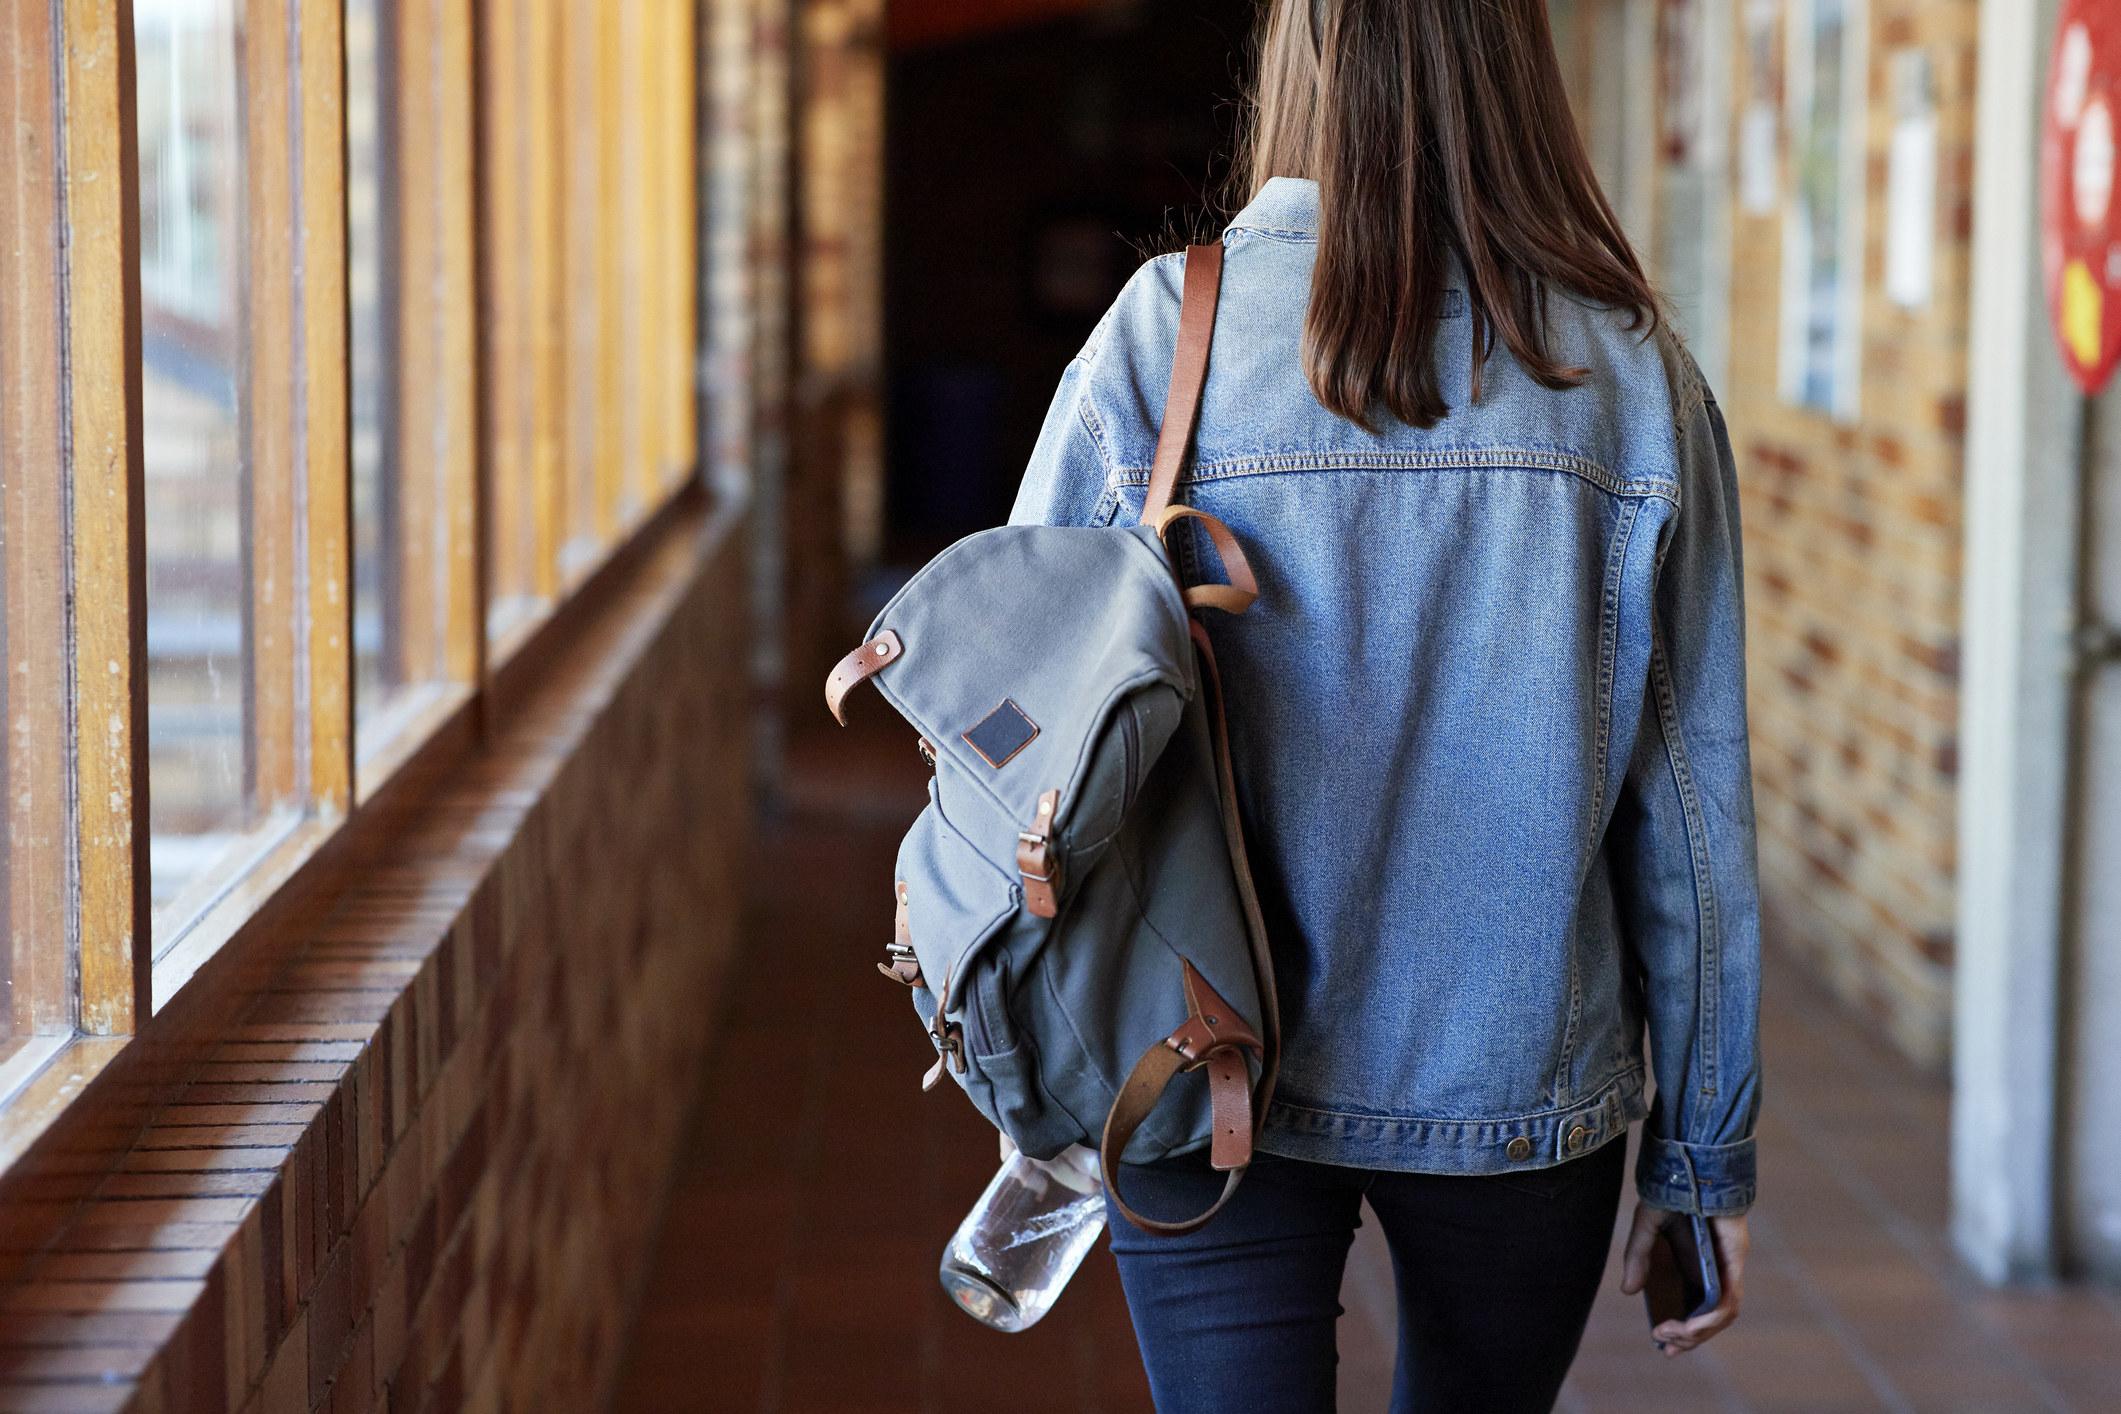 Model wearing a backpack